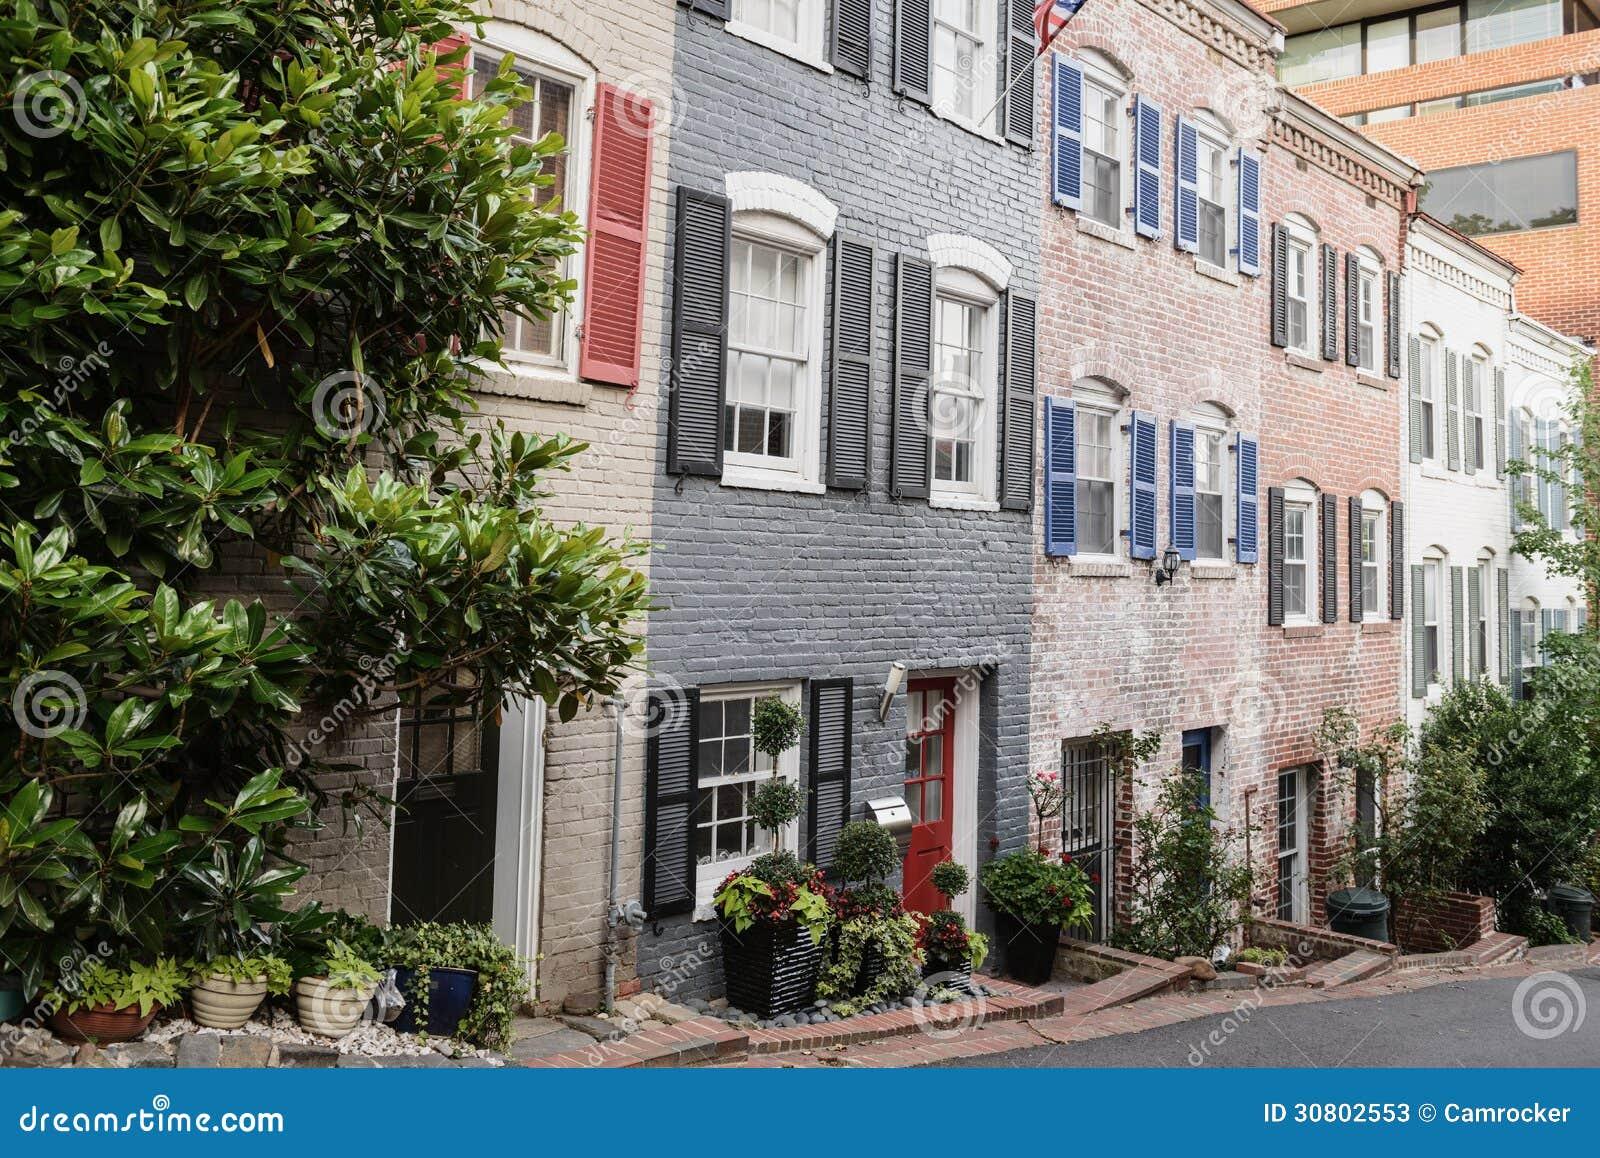 Case urbane a Georgetown, Washington DC